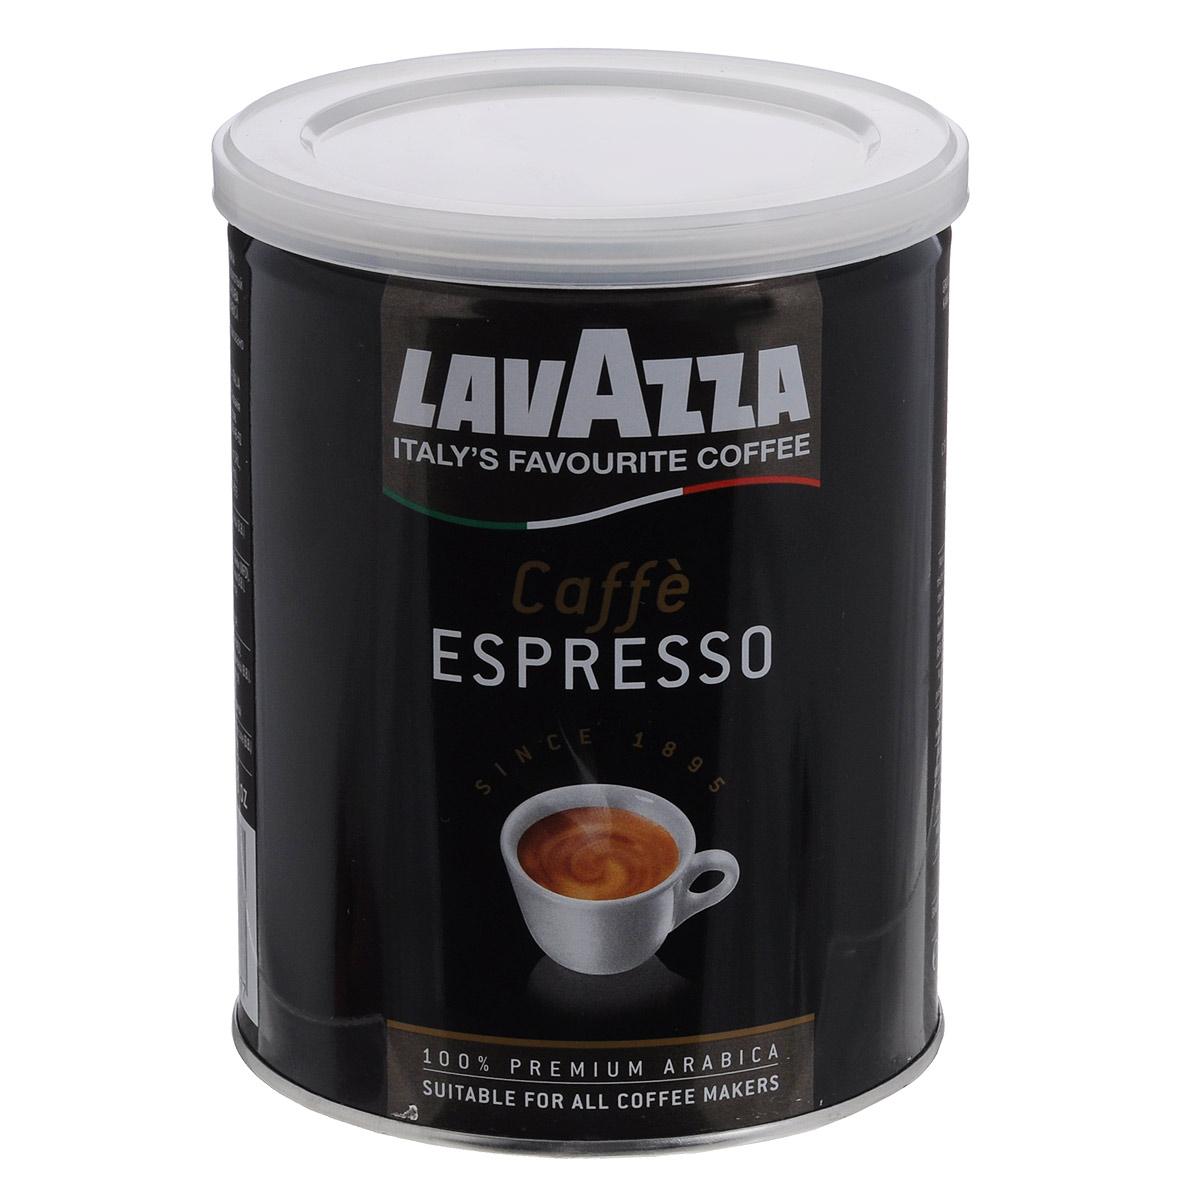 Lavazza Caffe Espresso кофе молотый, 250 г (ж/б) piazza del caffe espresso кофе в зернах 1 кг